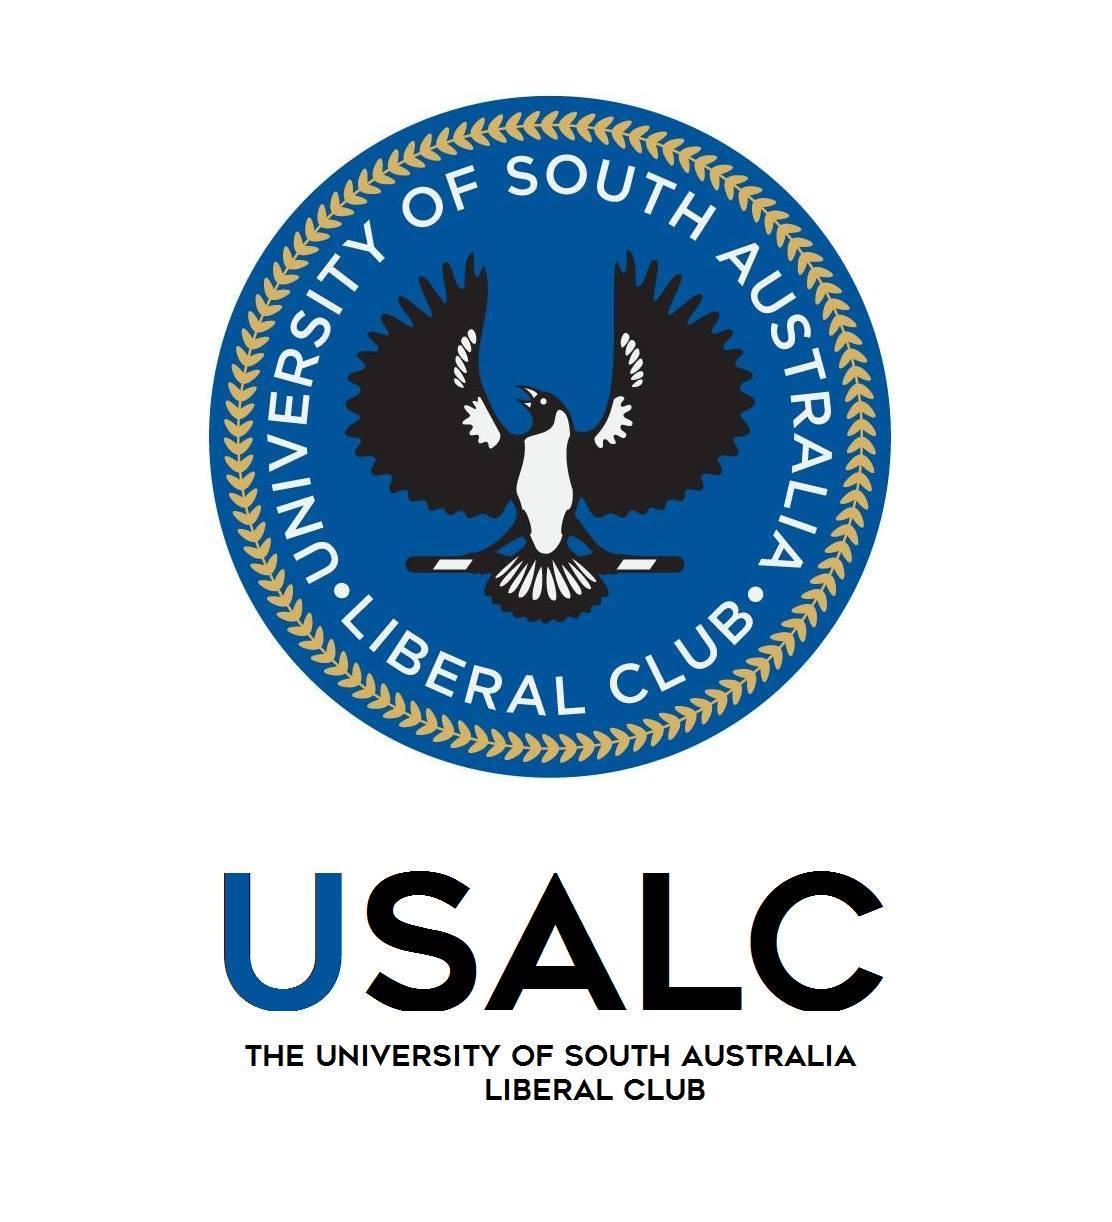 https://www.alsf.org.au/wp-content/uploads/2020/08/USALC.jpg